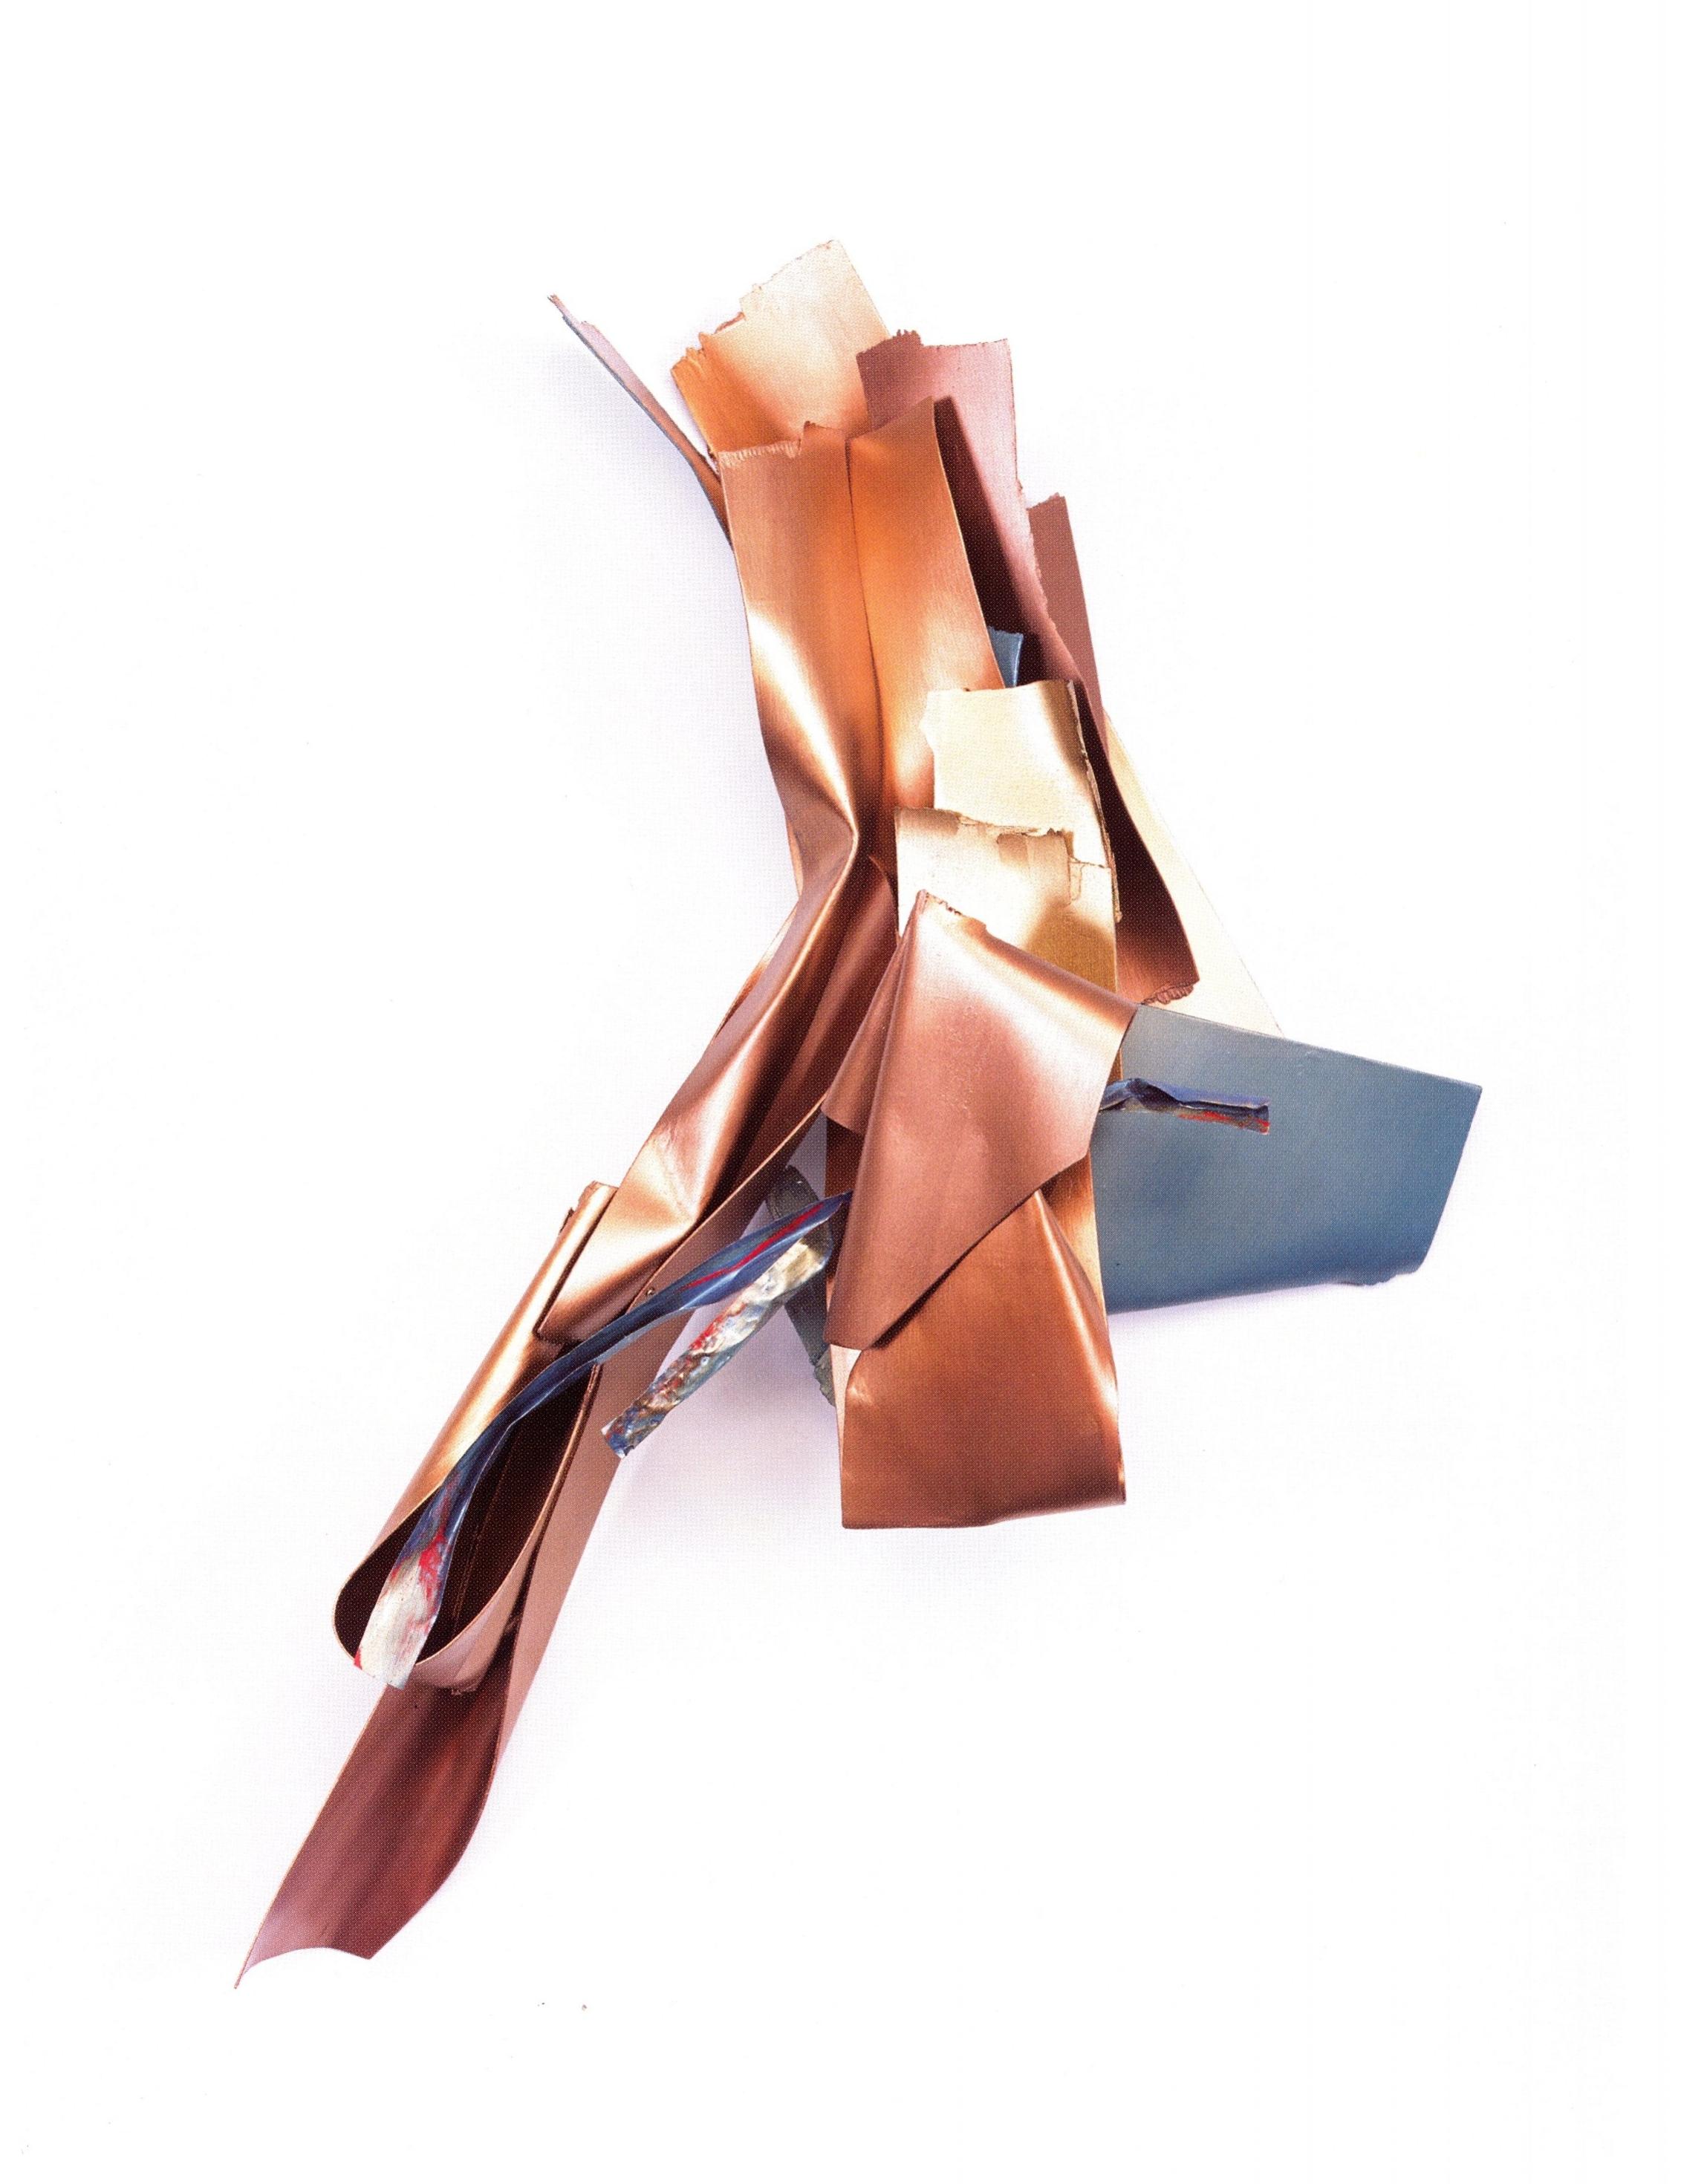 Susan Manspeizer   #203 Shades of Life  , Painted Wood / Metal, 45'' x 28'' x 13'', 2003